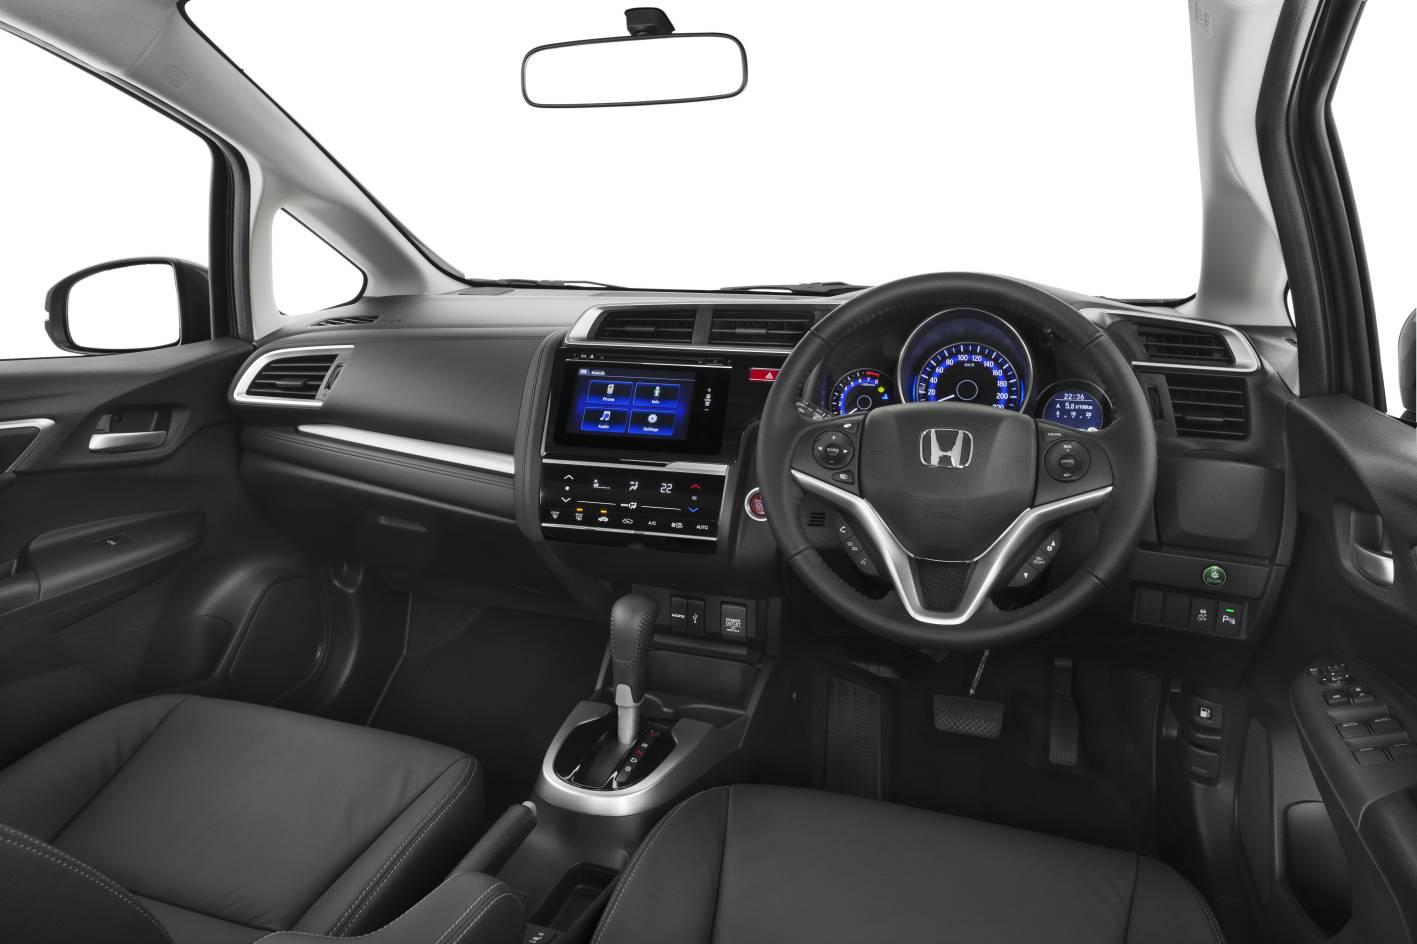 Interior honda fit fuse box location trusted wiring diagram jpg 1417x944  Honda element fuse box location